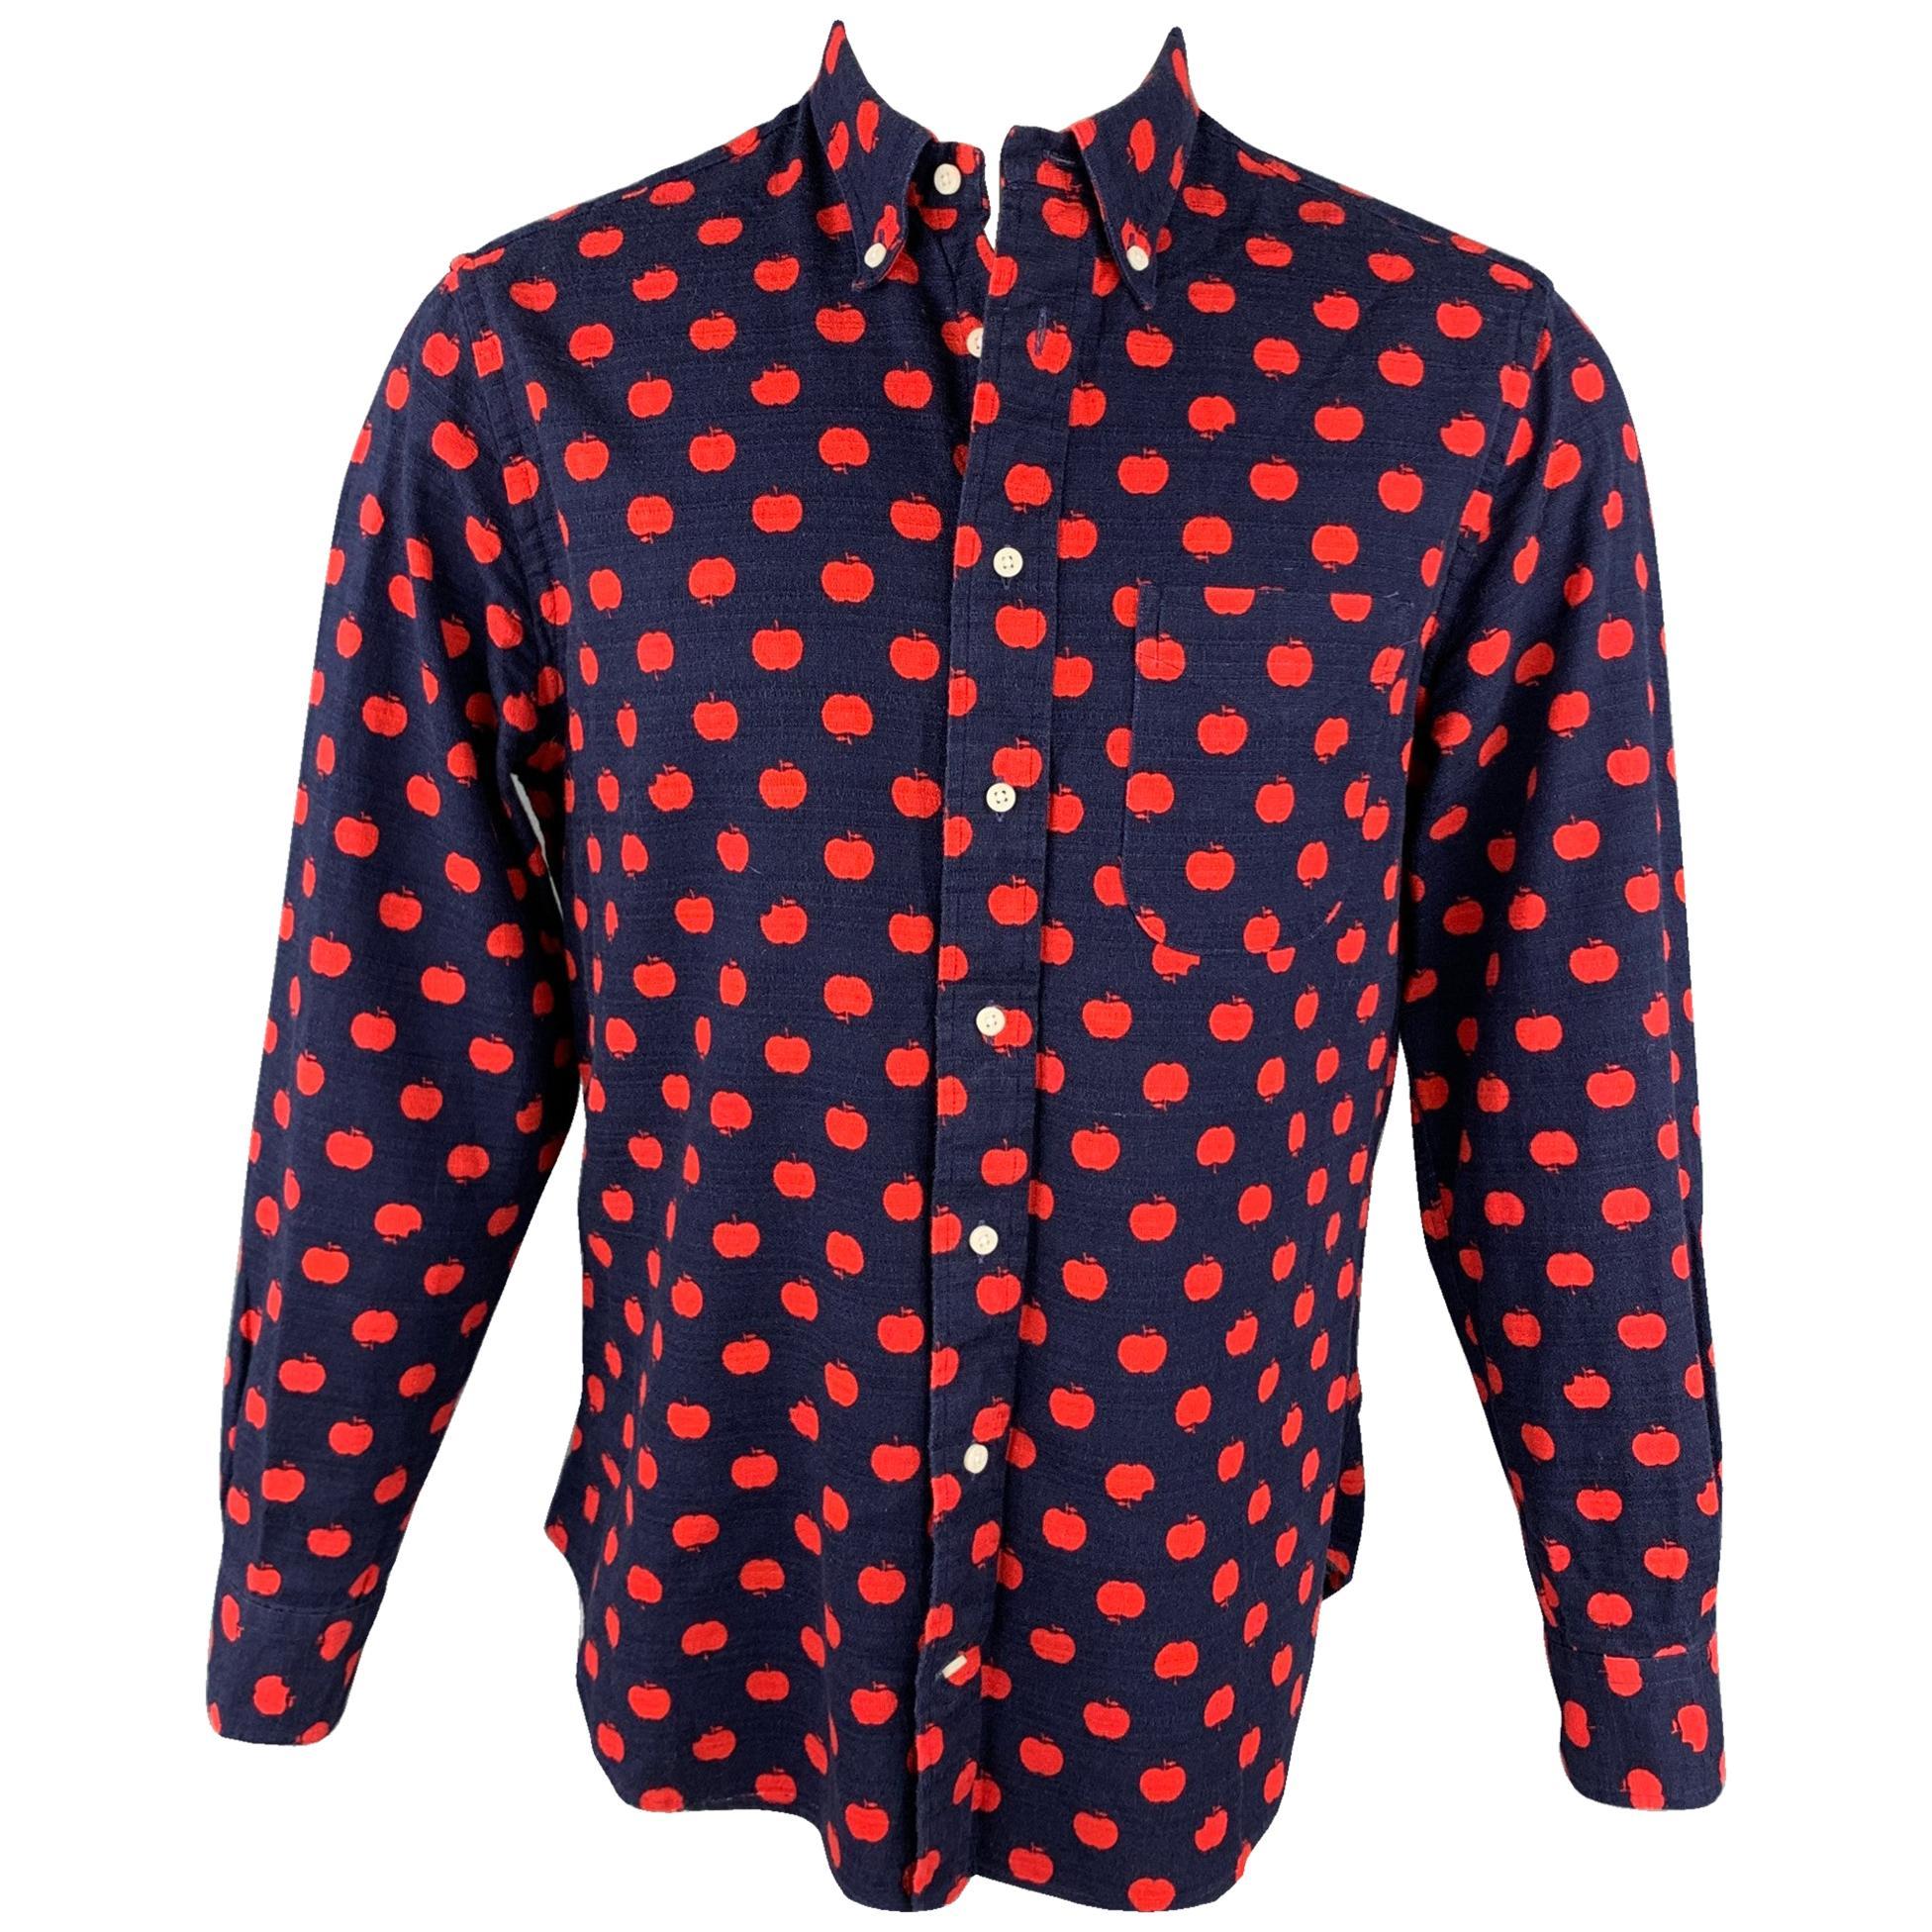 GITMAN VINTAGE Size L Navy & Red Apple Print Cotton Button Down Shirt